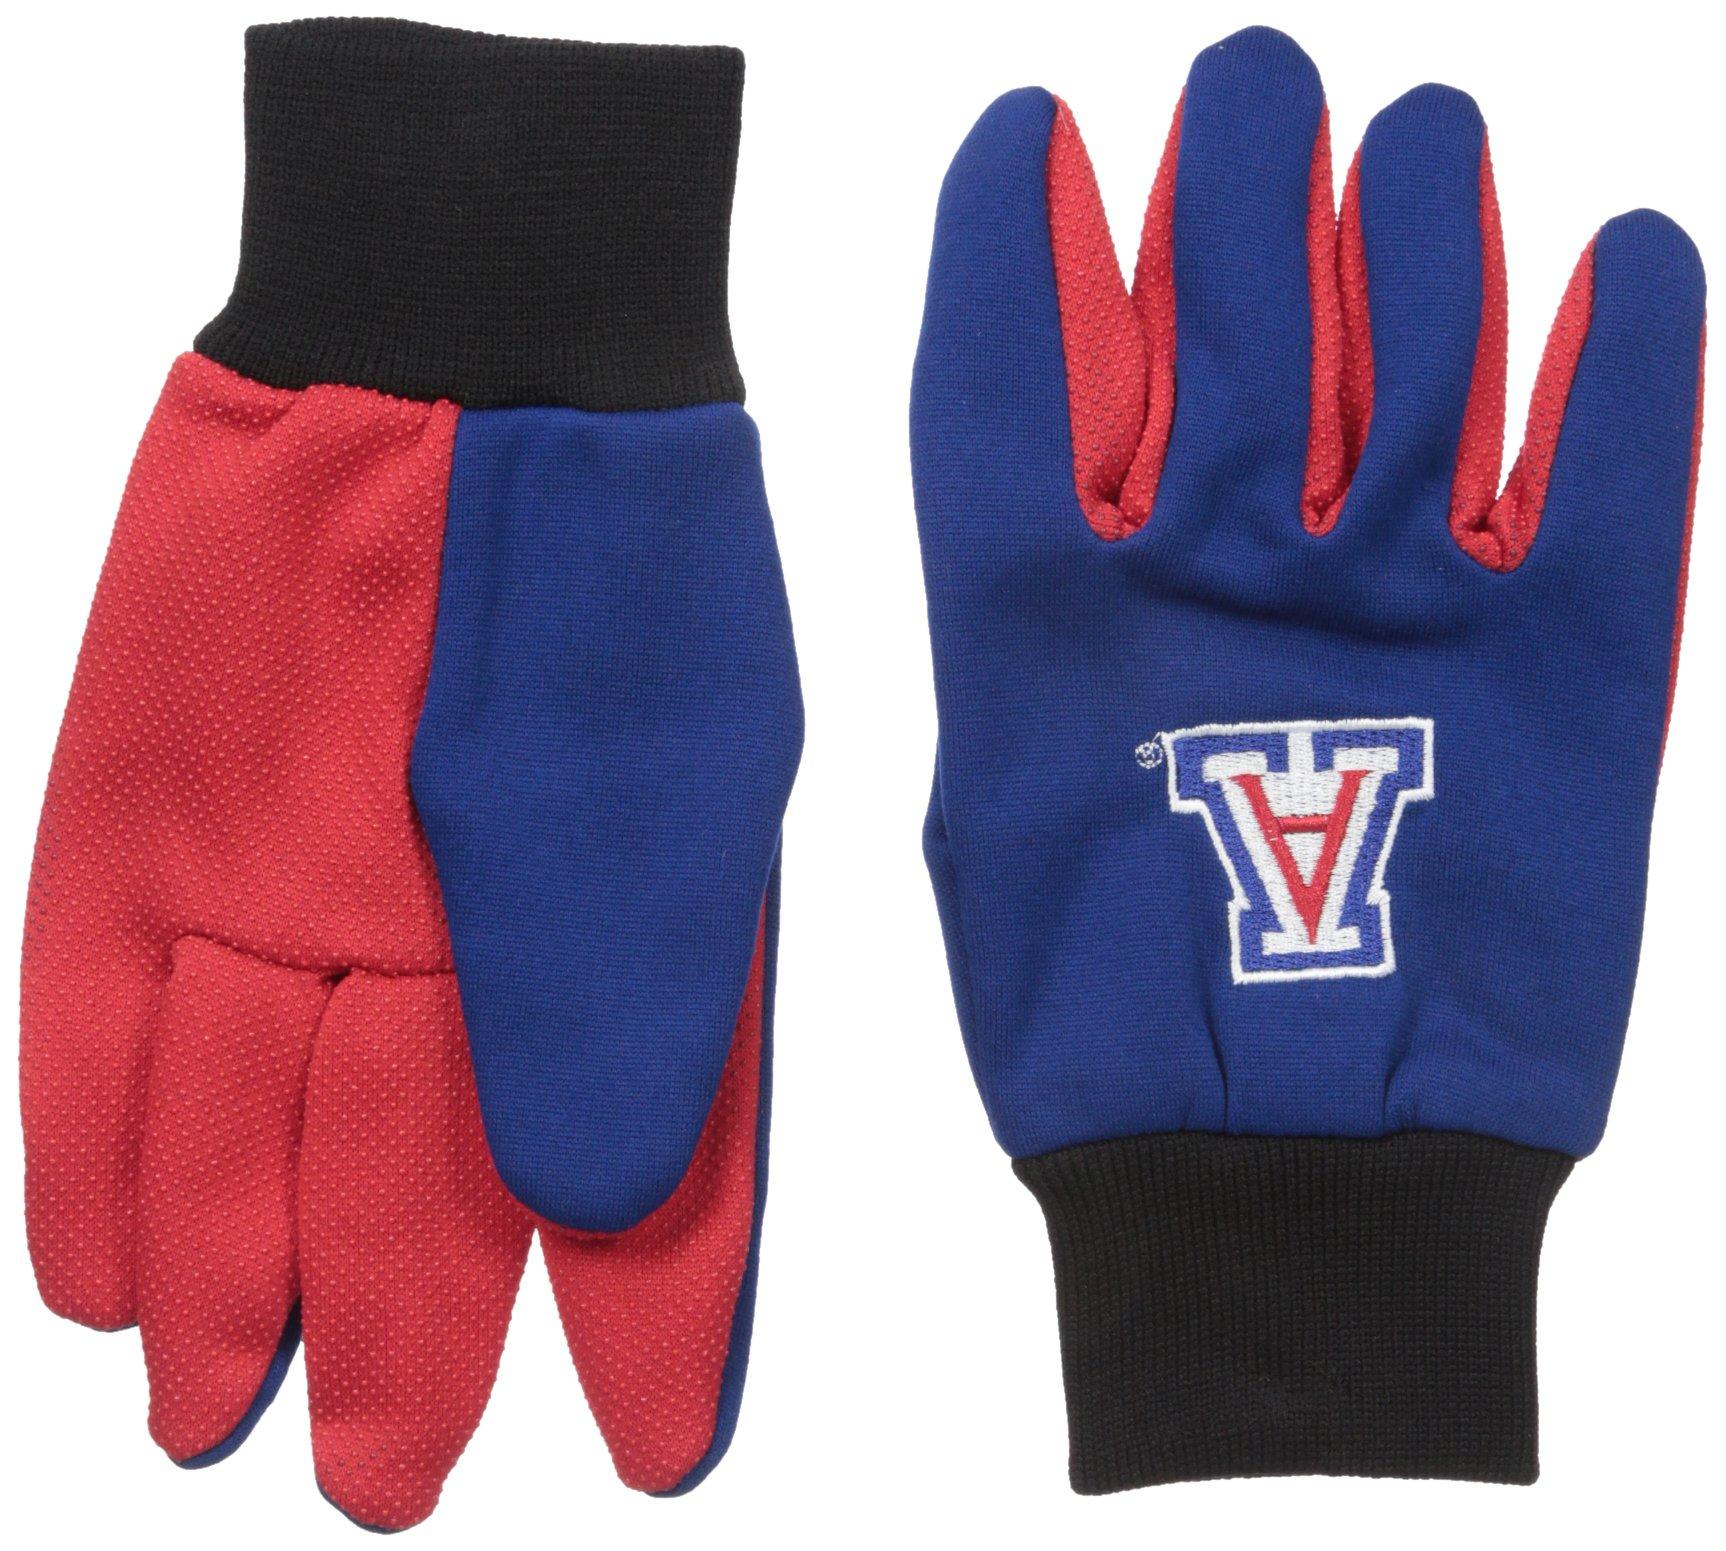 Arizona 2015 Utility Glove - Colored Palm